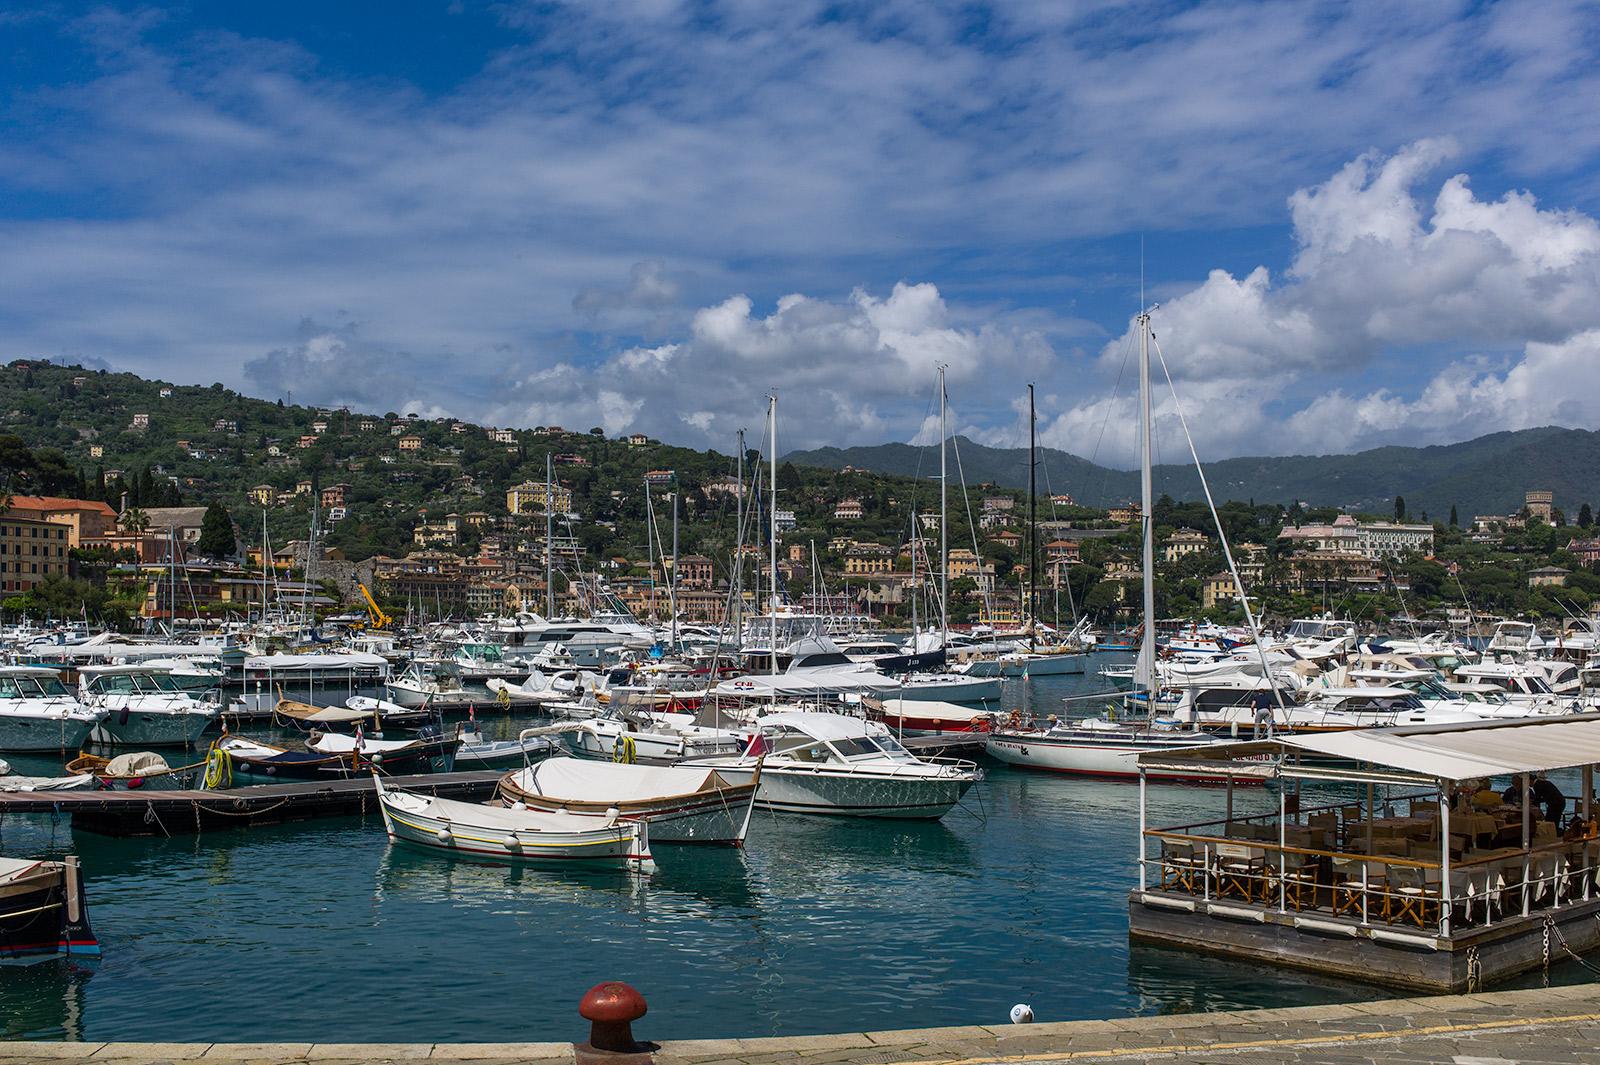 Santa Margherita Ligure